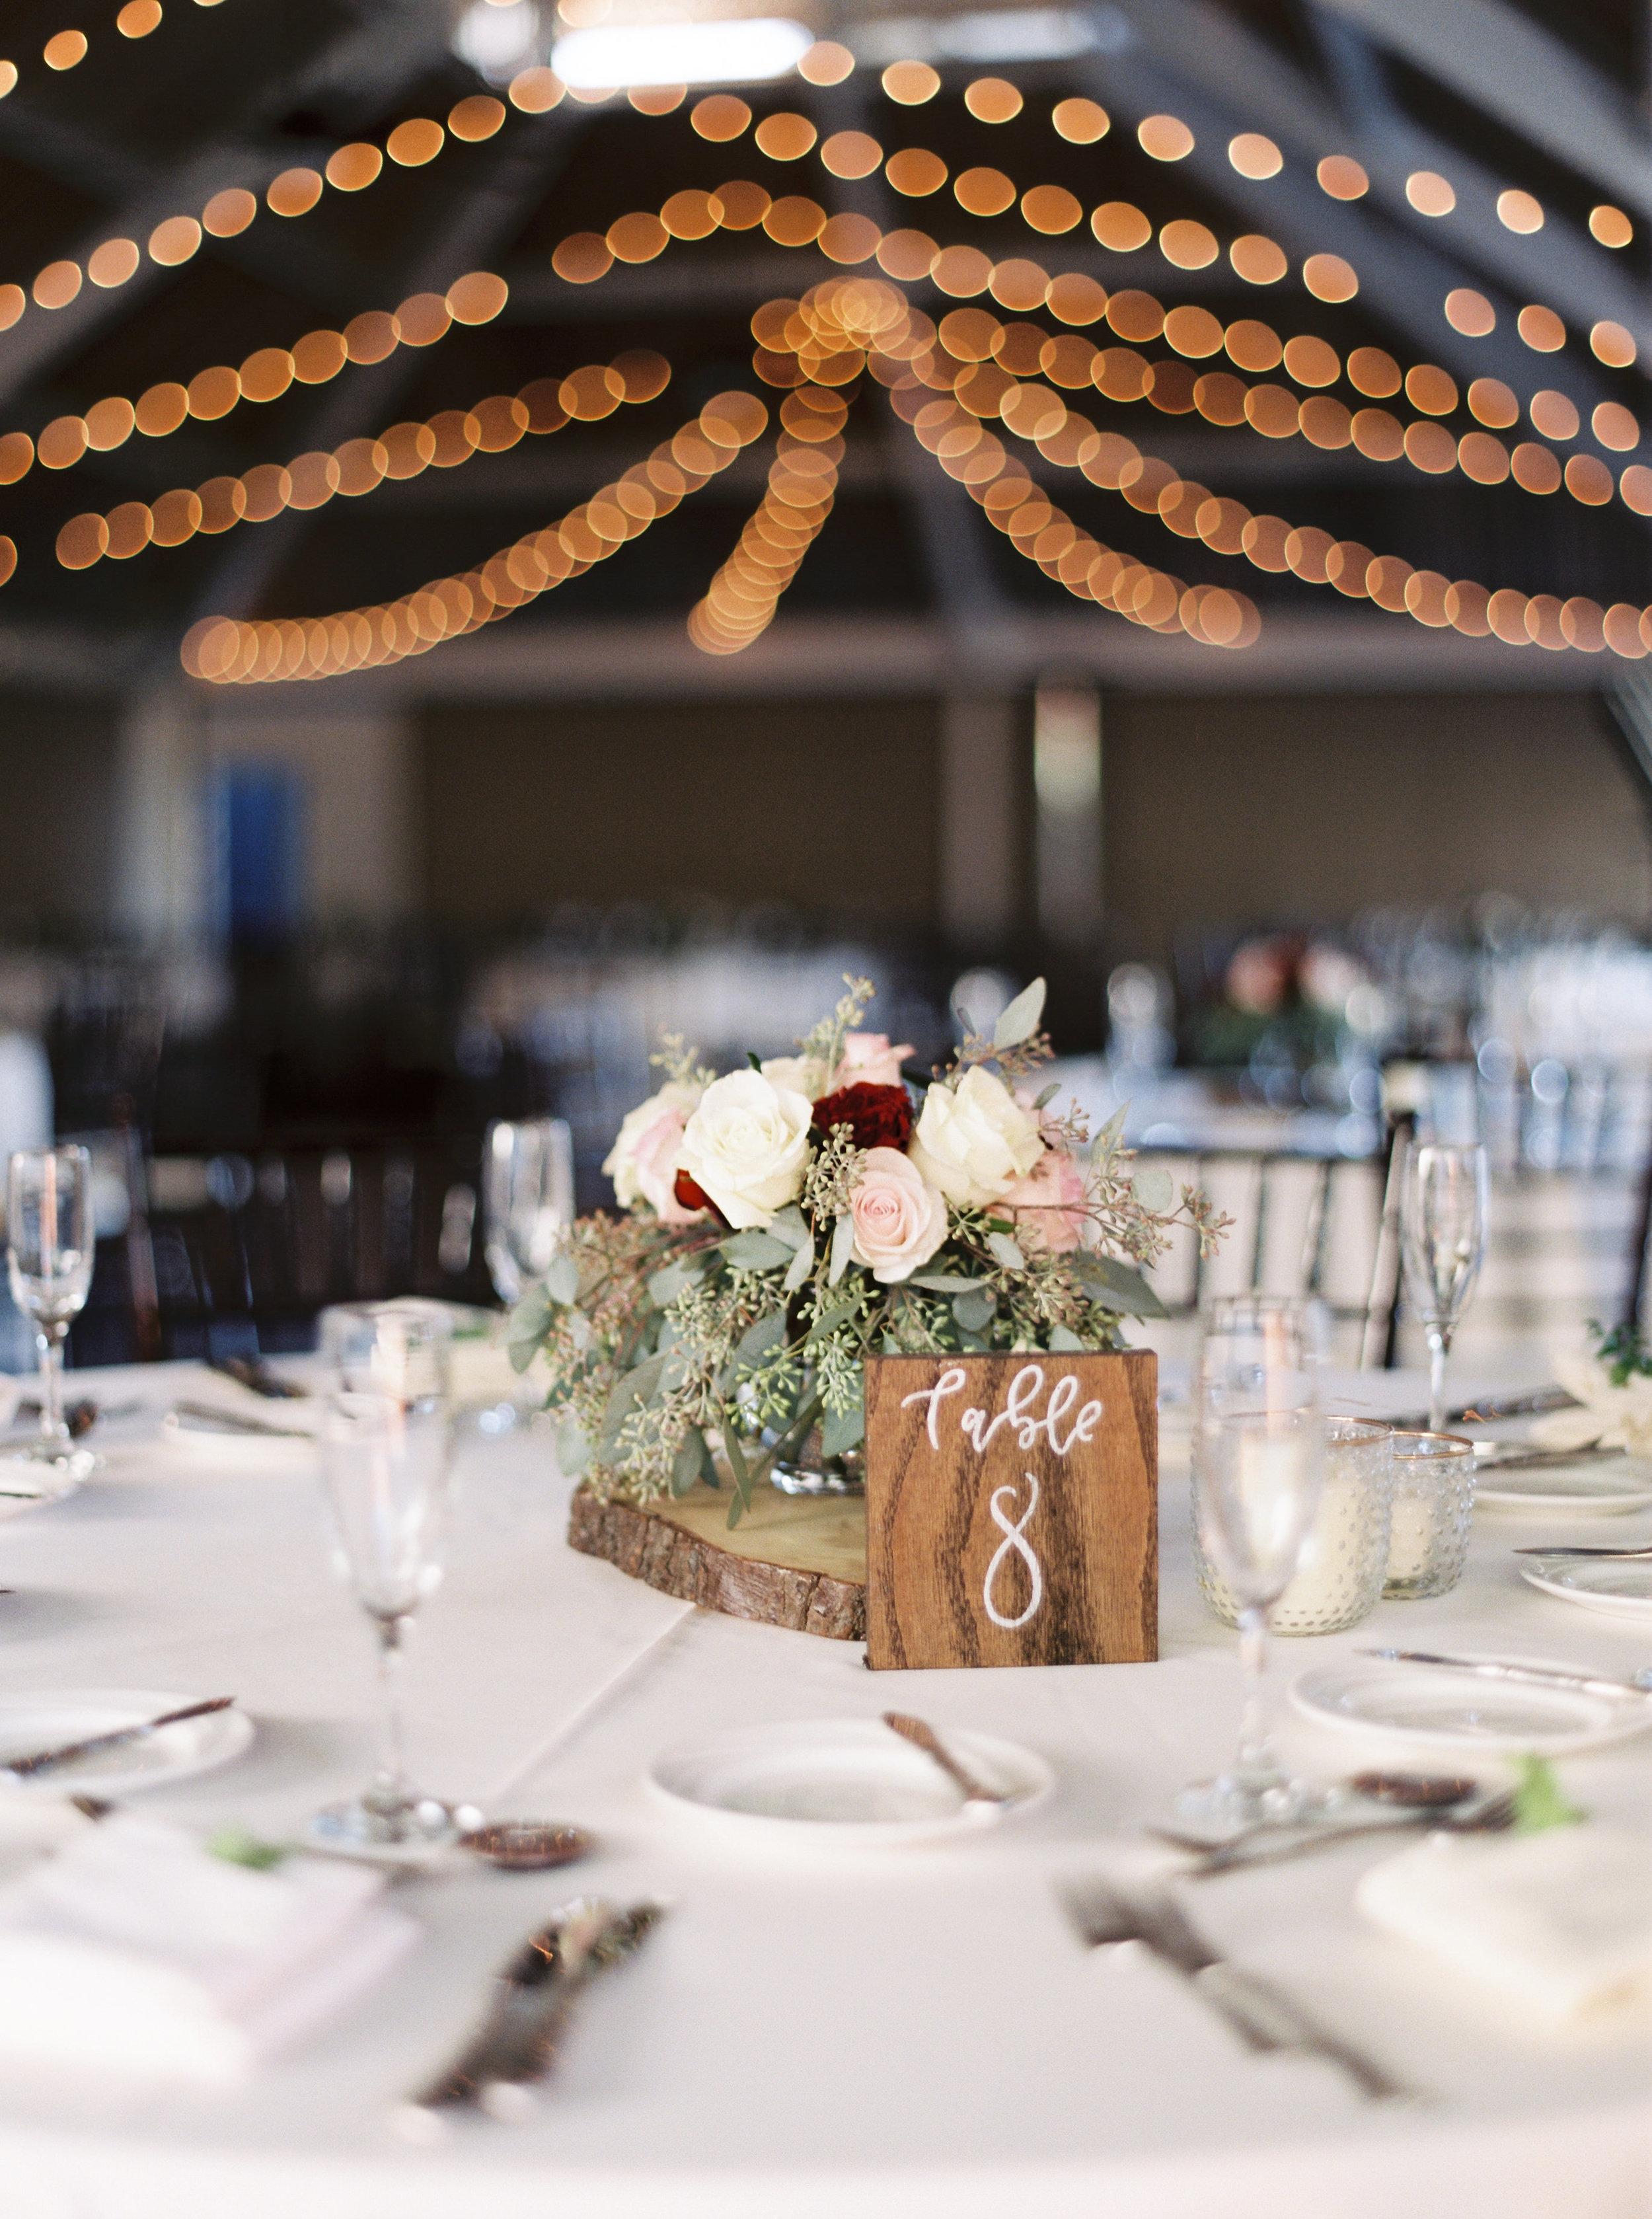 Tenaya-lodge-wedding-at-yosemite-national-park-california-70.jpg